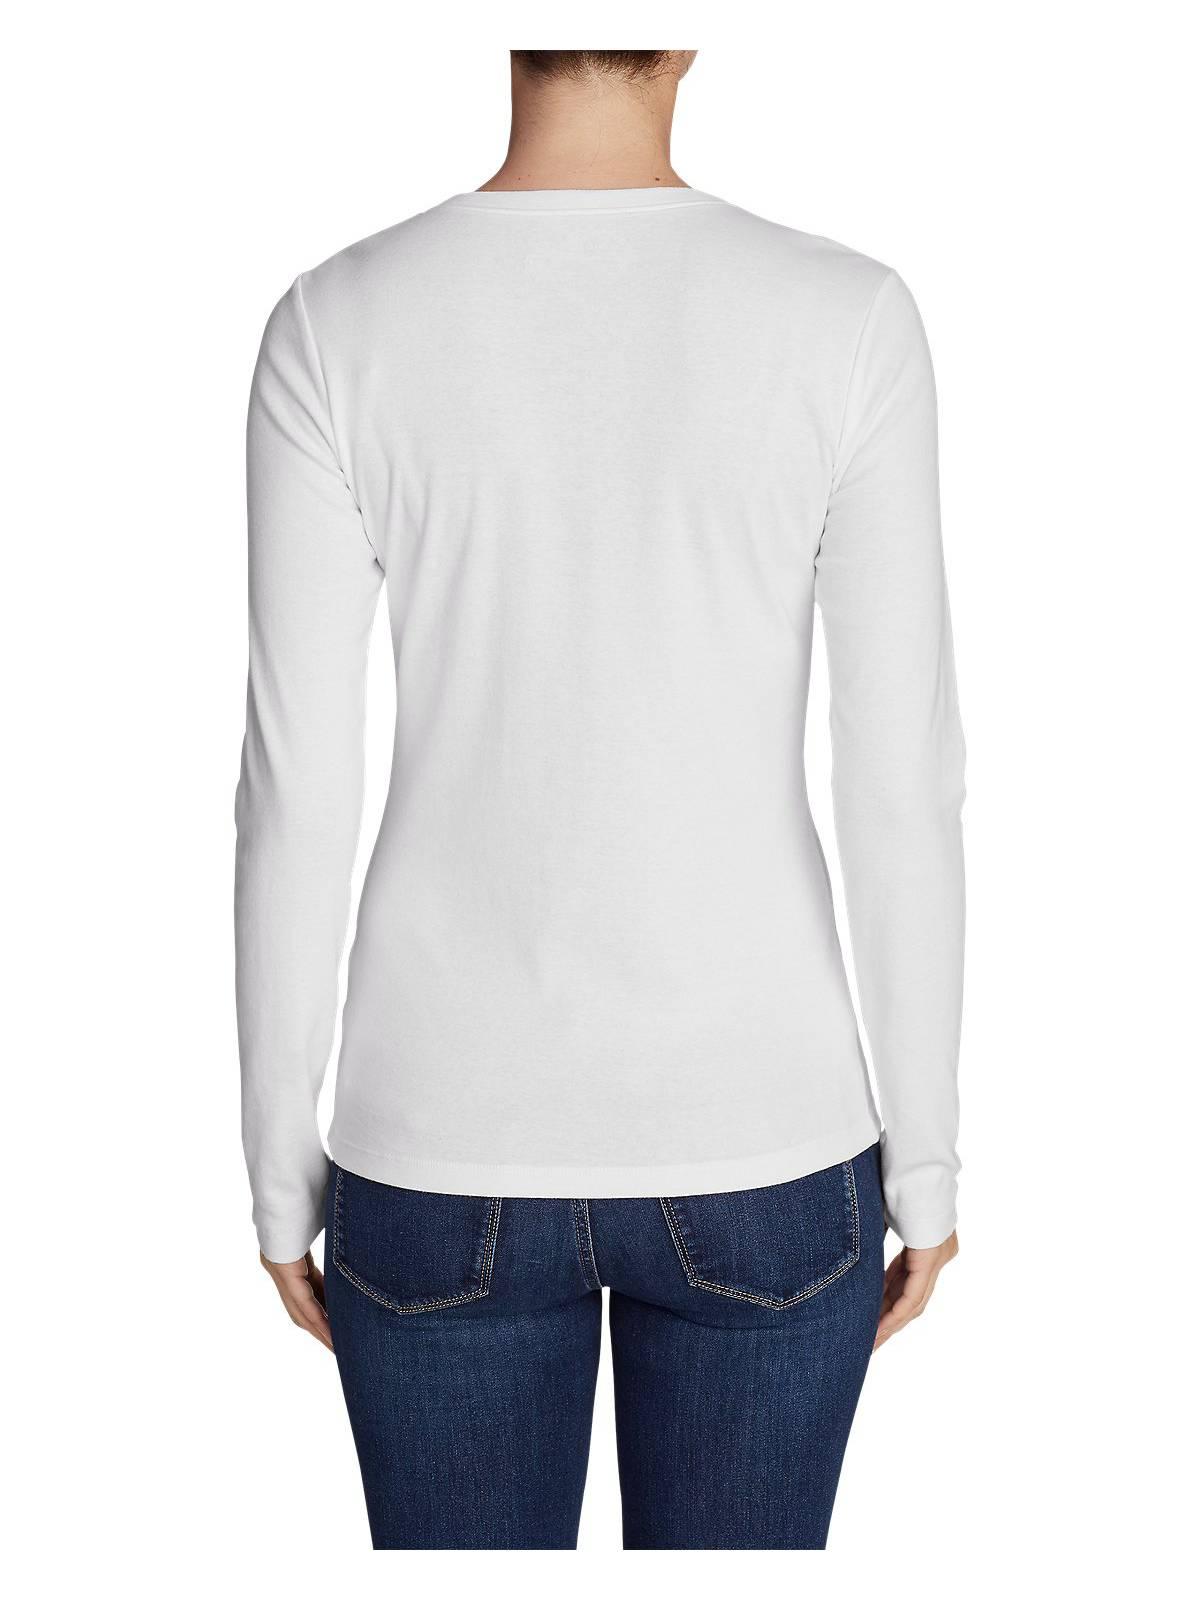 Eddie-Bauer-Women-039-s-Favorite-Long-Sleeve-Crewneck-T-Shirt thumbnail 61